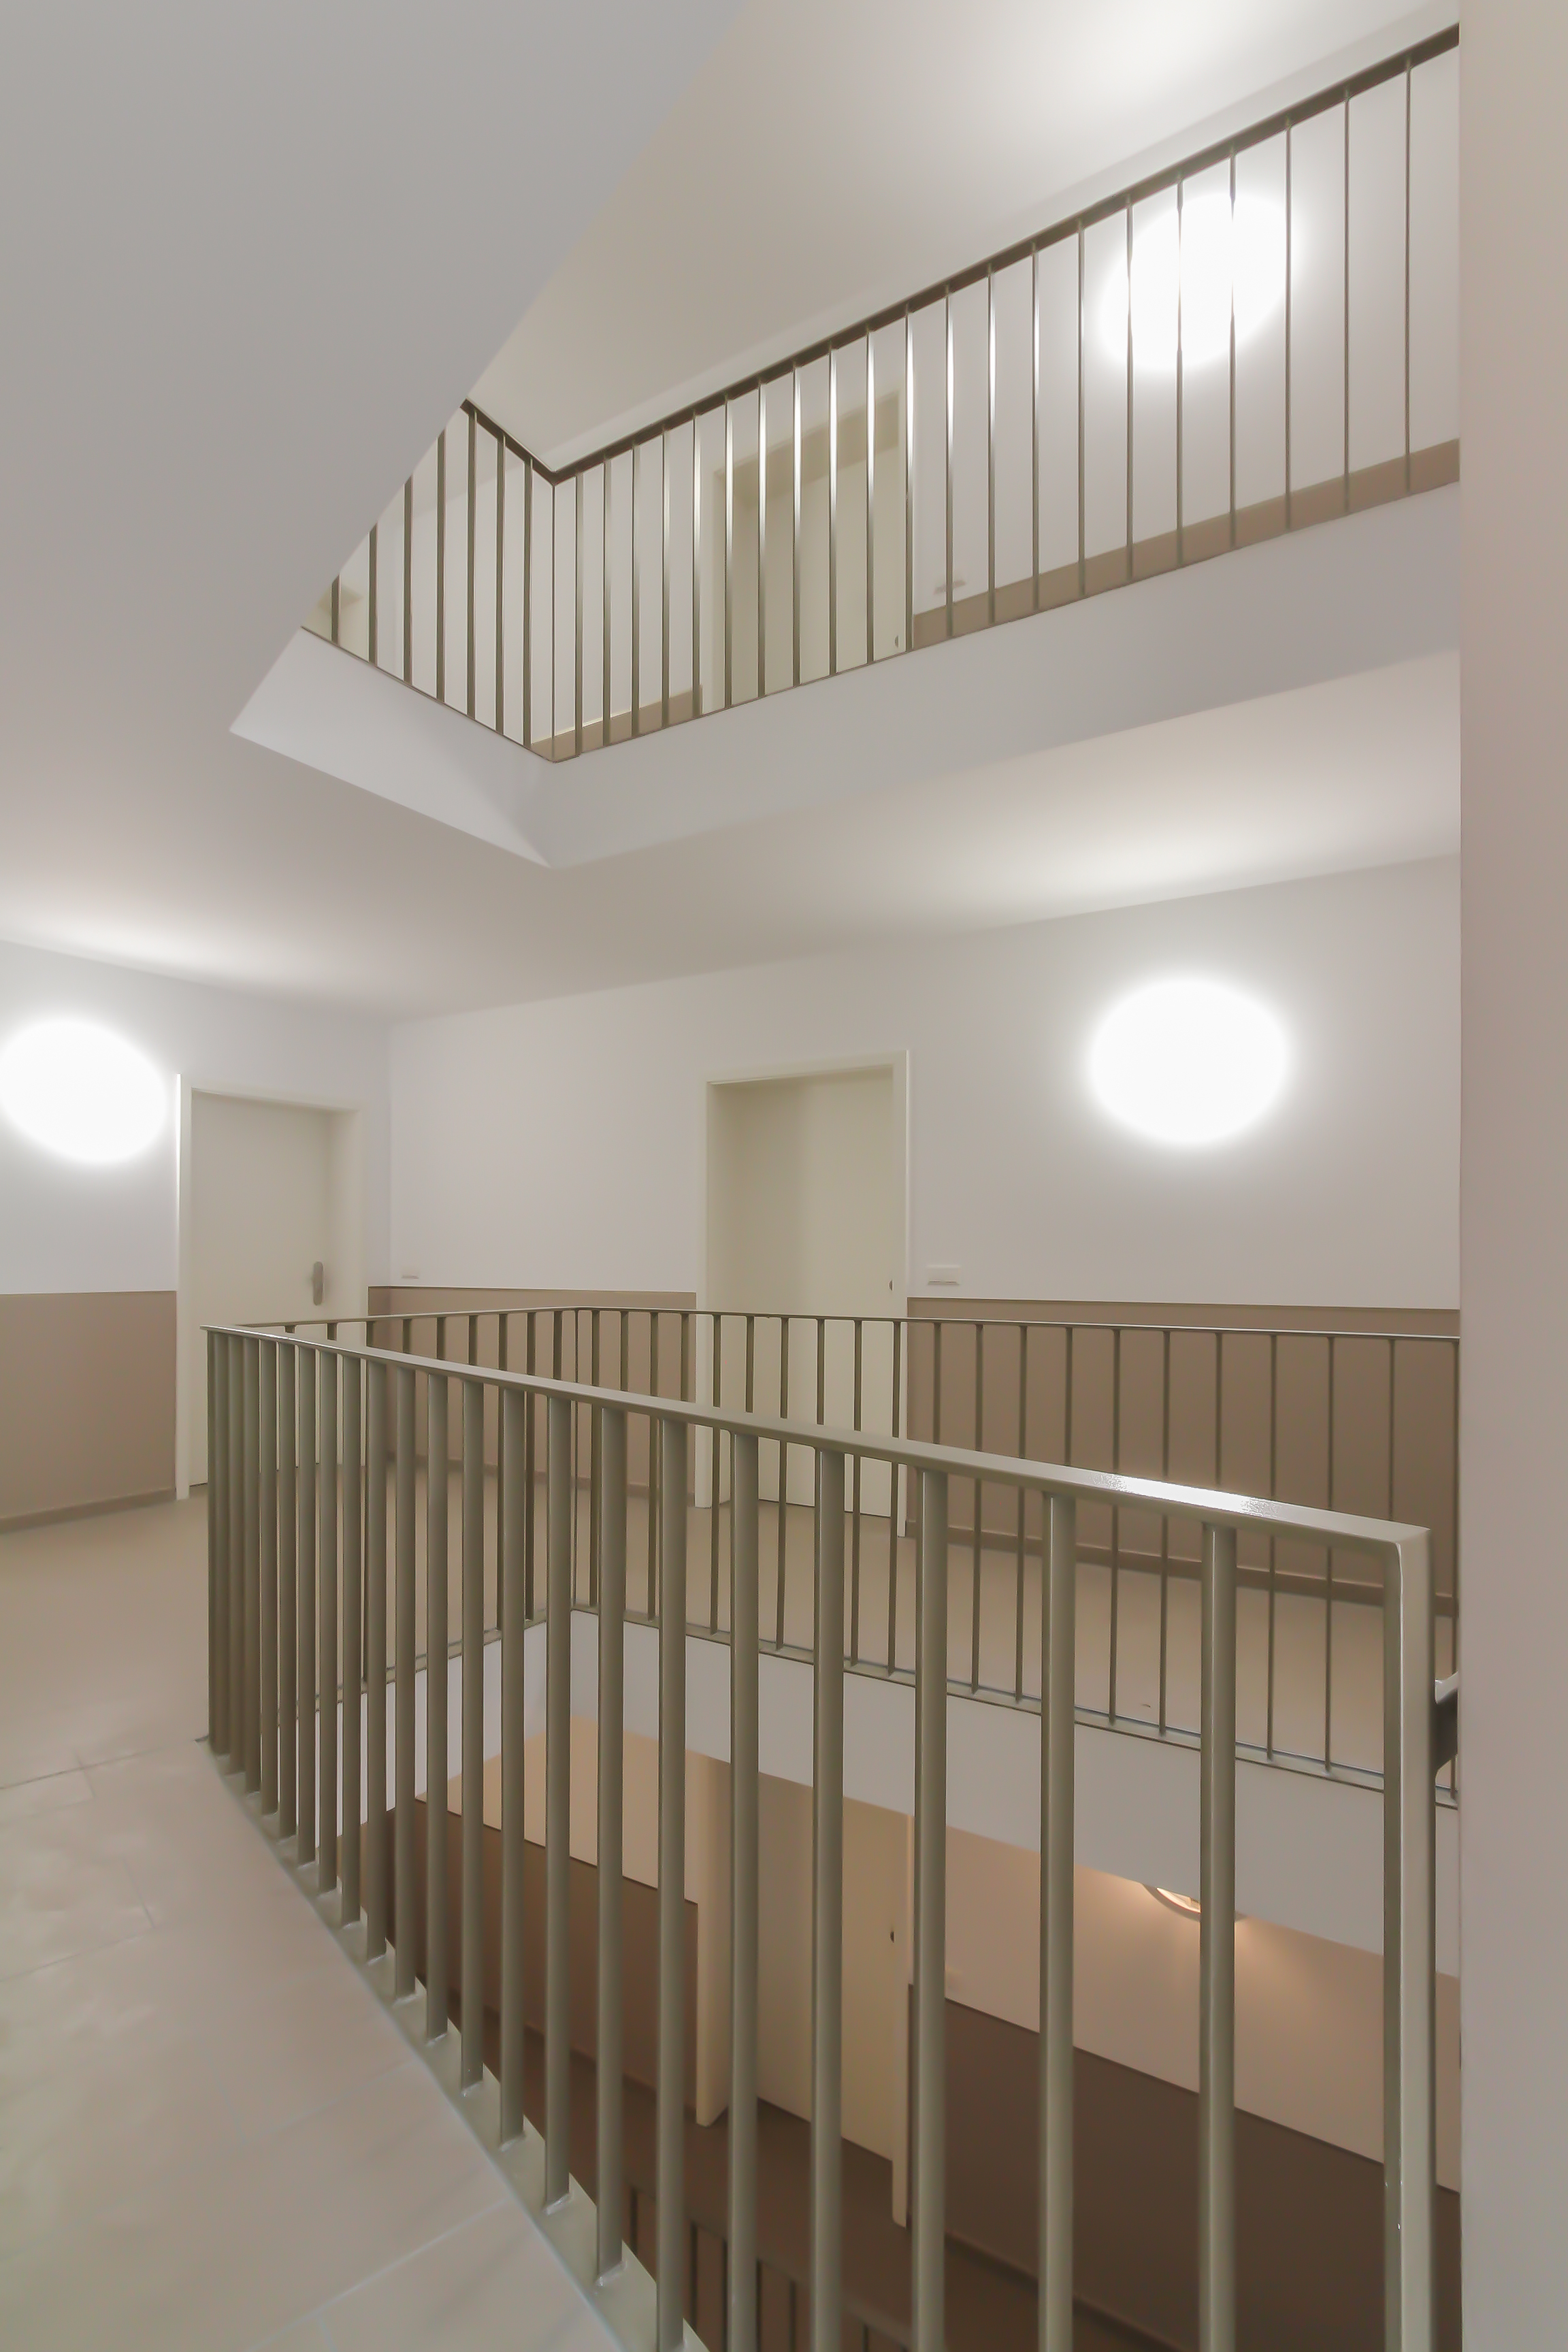 Treppenhaus mehrfamilienhaus  KL 28 Mehrfamilienhaus · Erfurt · Architekturführer Thüringen